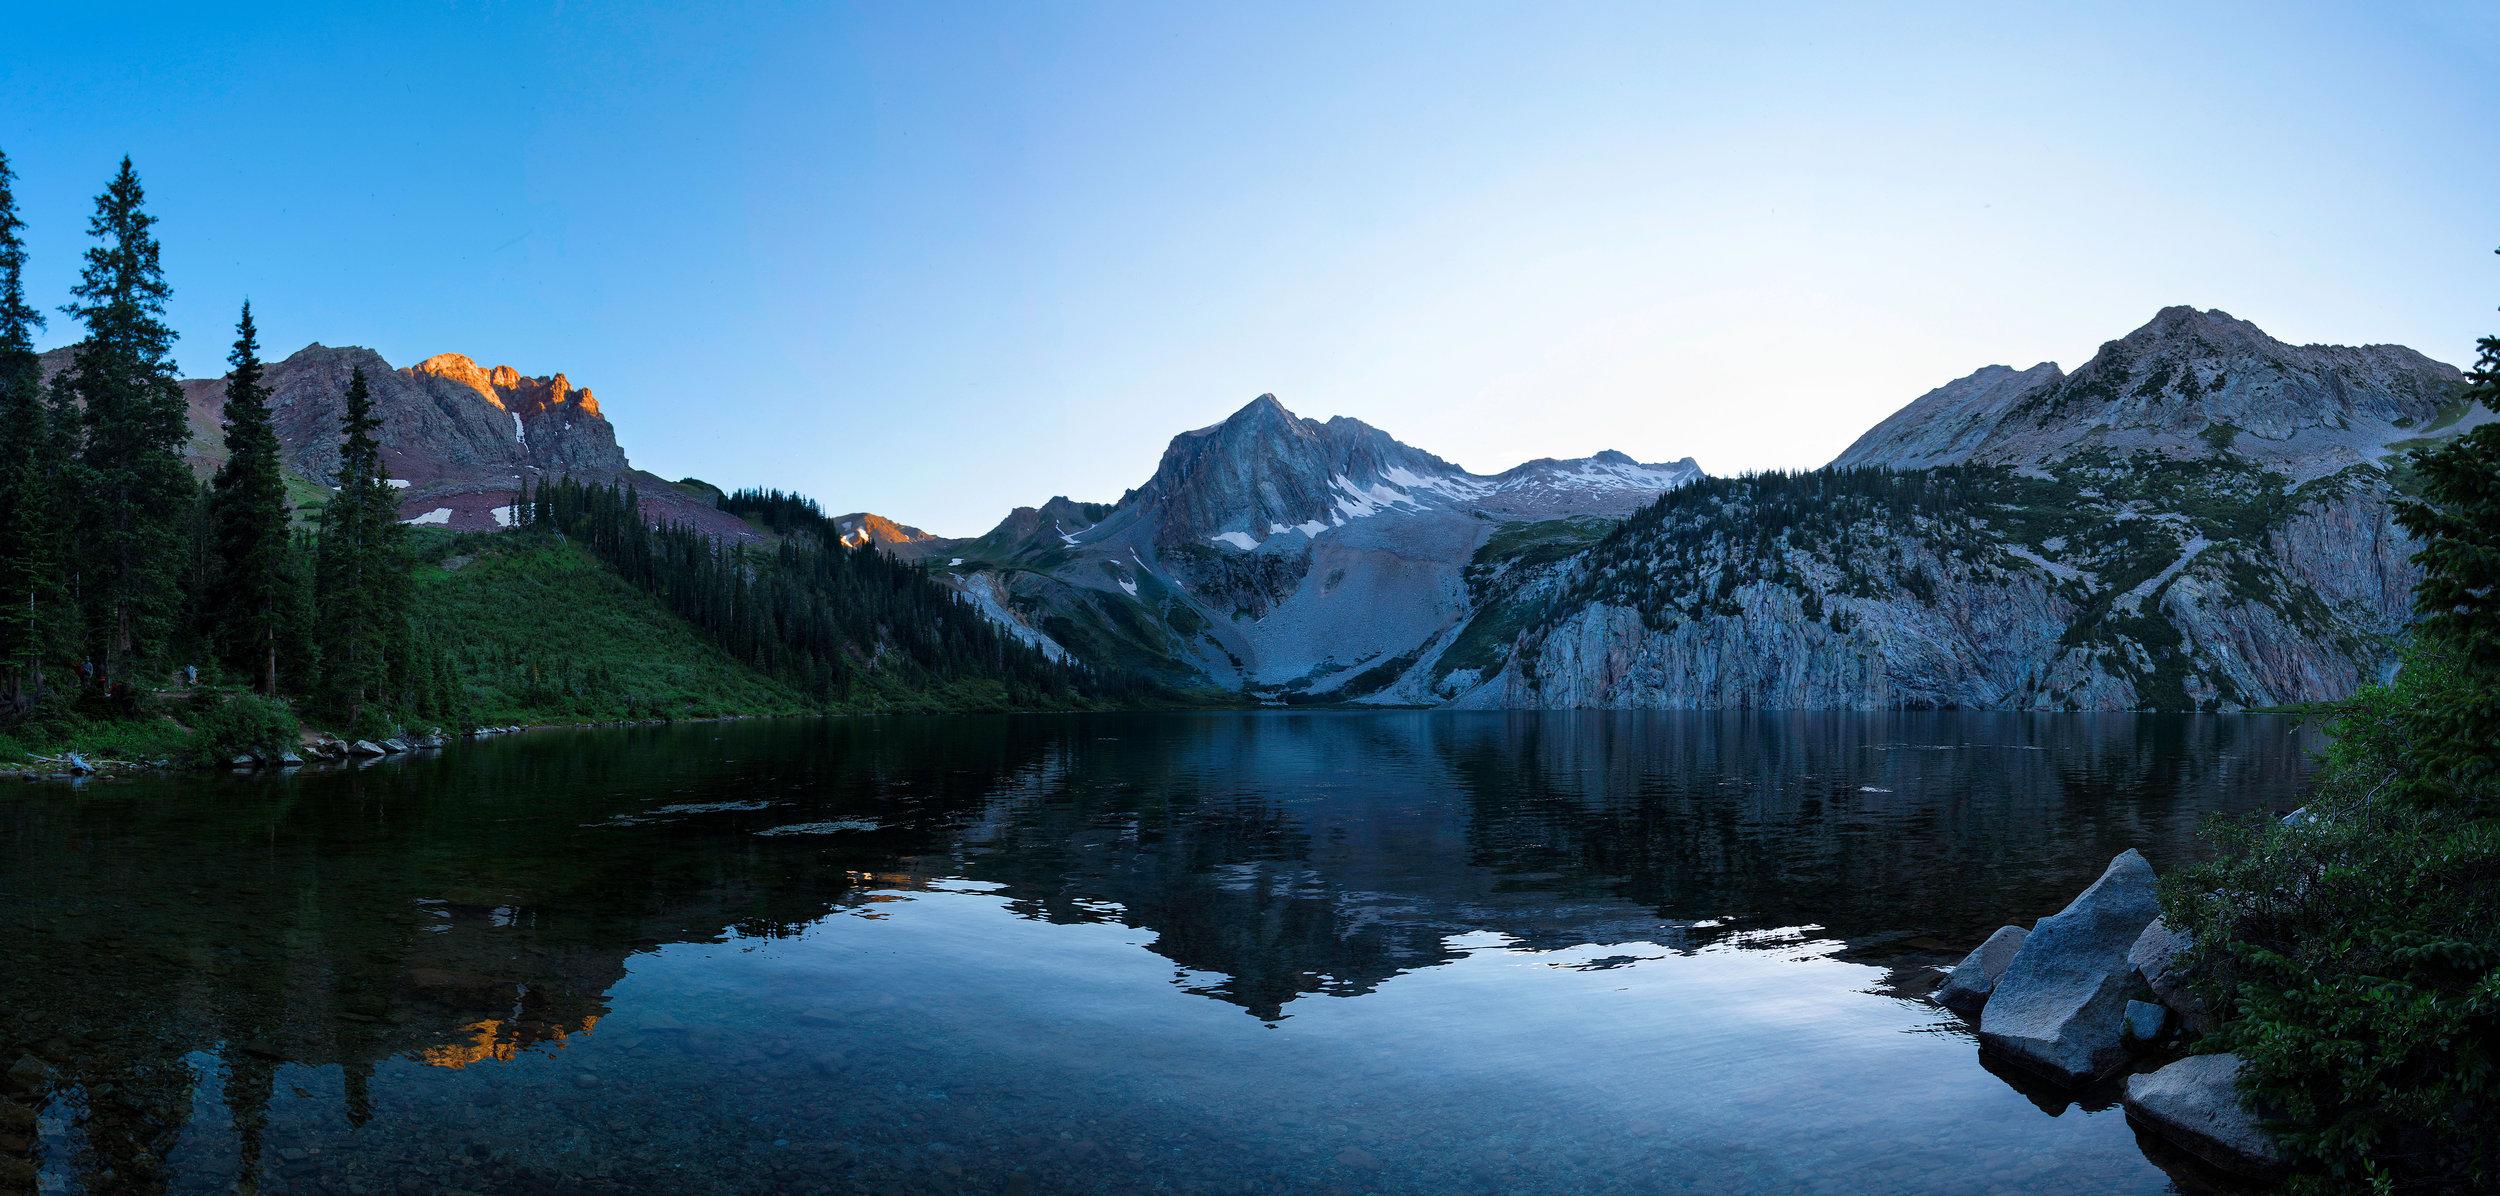 Sunrise at Snowmass Lake, Colorado